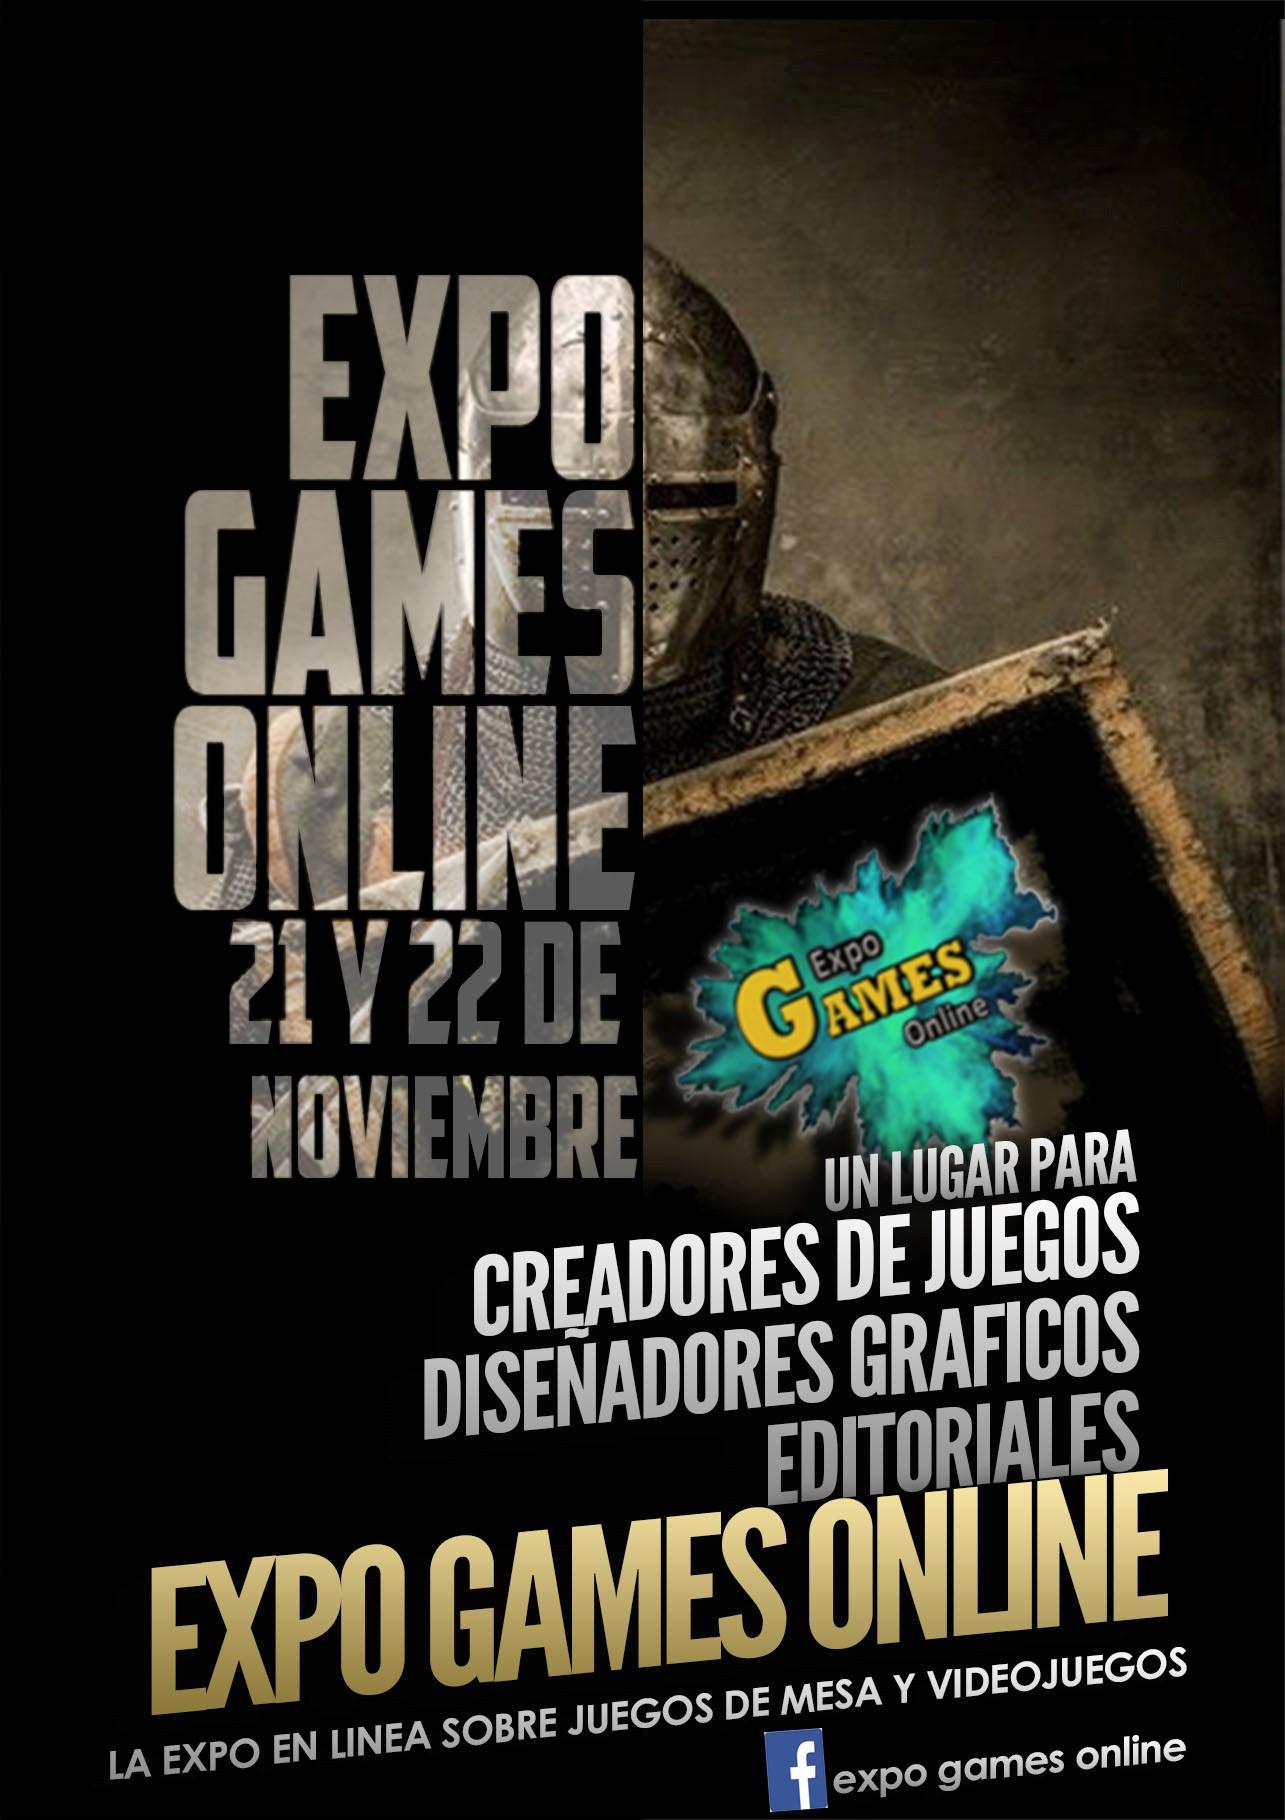 Expo Games online